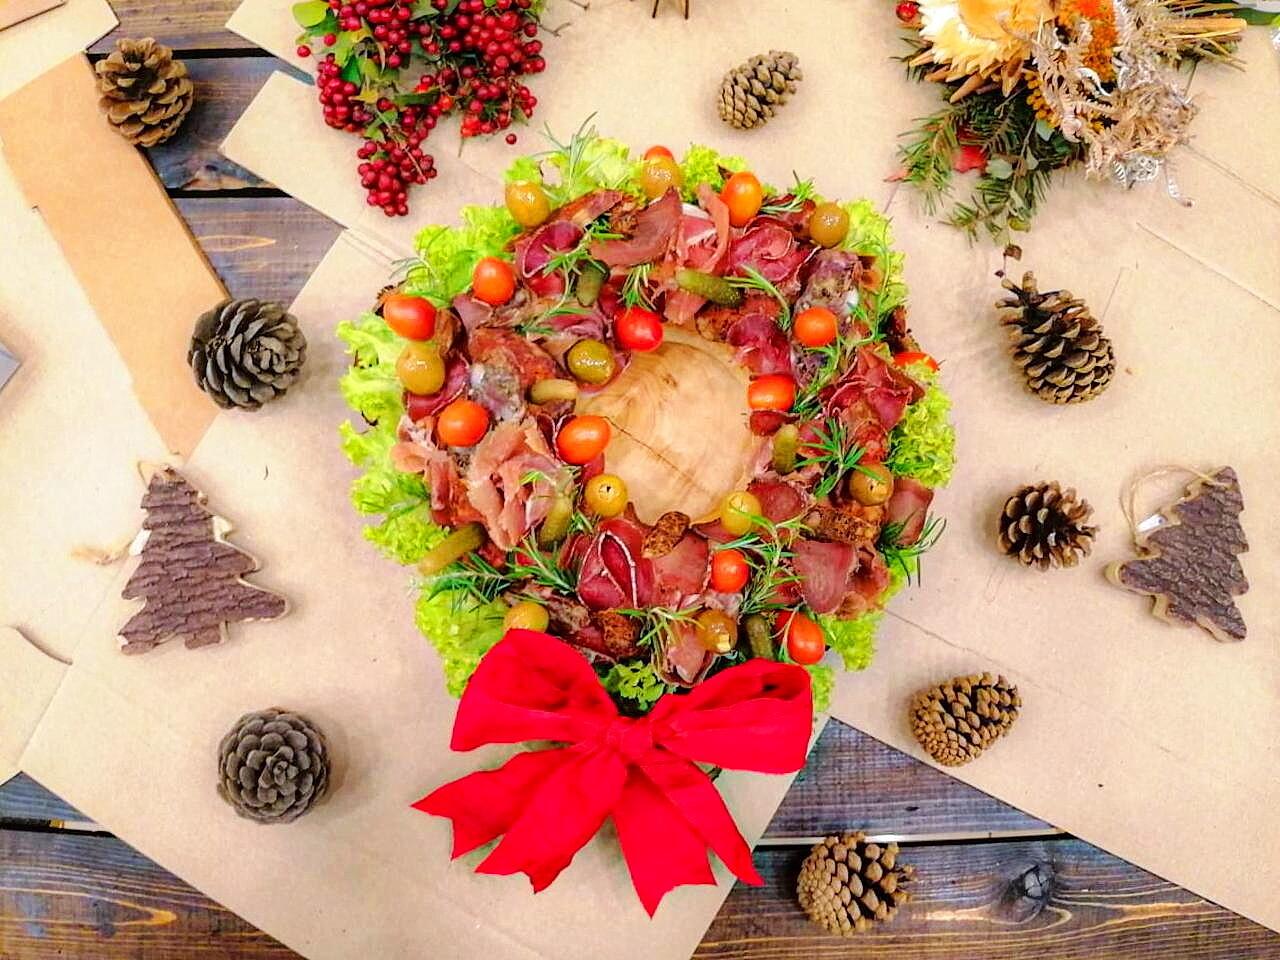 Christmas Coldcut's Wreath - Chef. Marc Ghaoui